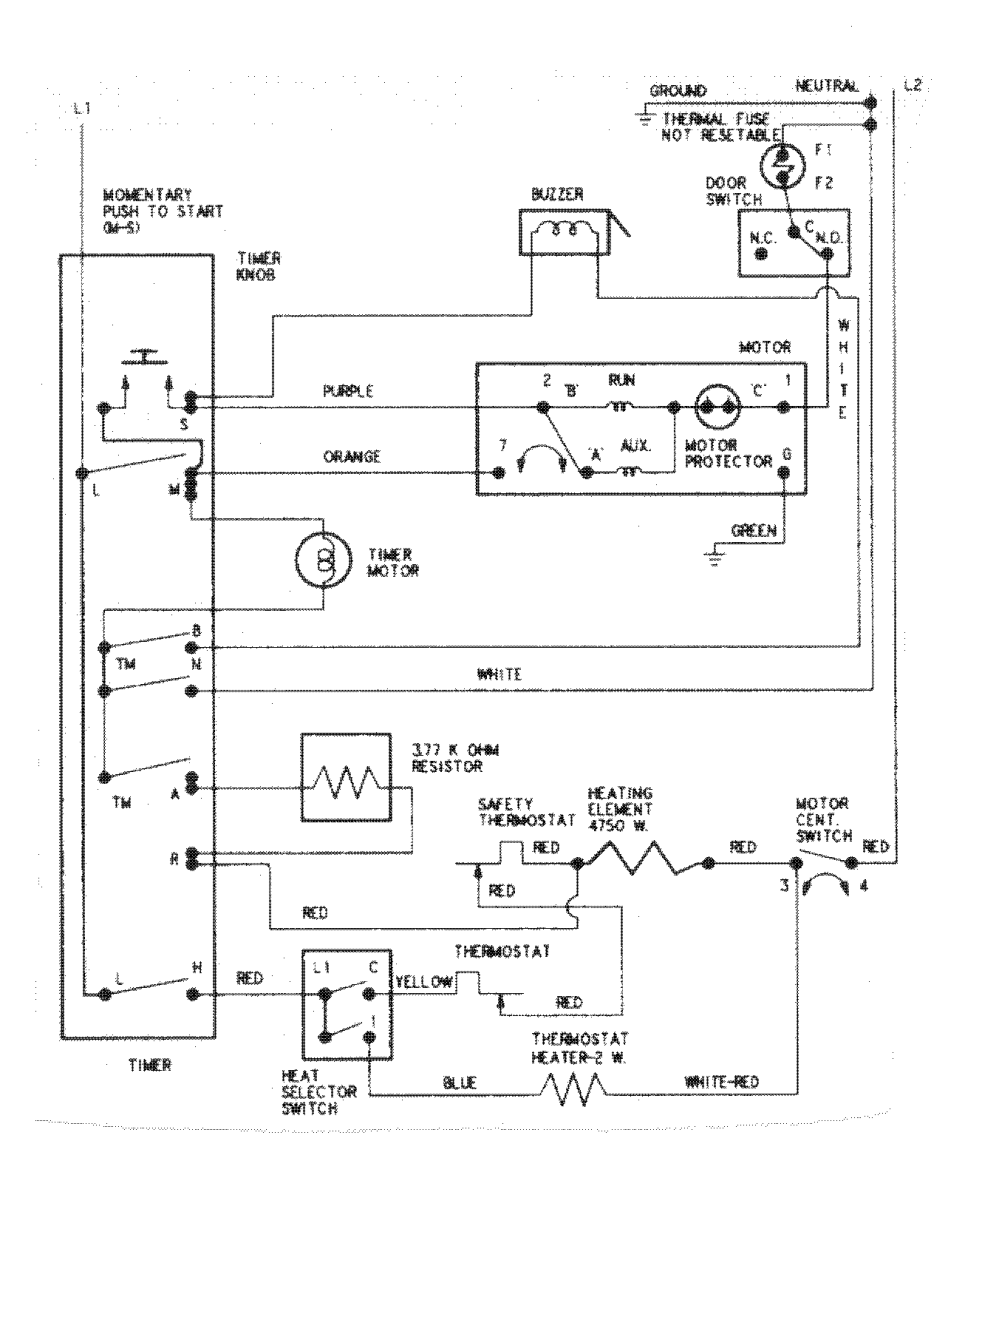 medium resolution of crosley wiring diagram wiring diagramscrosley car wiring diagram wiring library am general wiring diagram crosley car